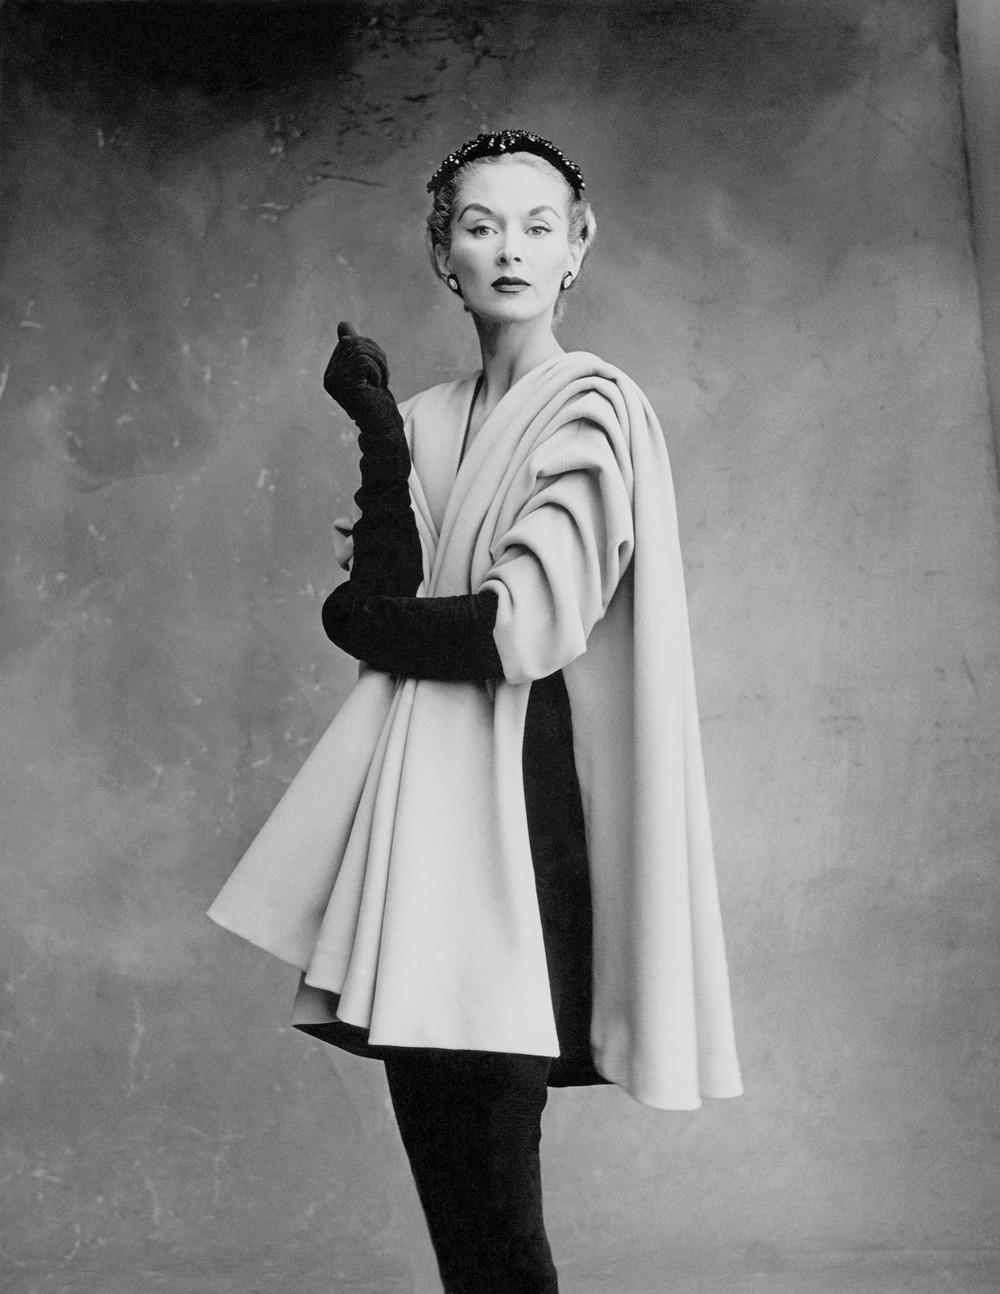 Lisa Fonssagrives-Penn wearing coat by Cristóbal Balenciaga, Paris, 1950. Photograph by Irving Penn © Condé Nast, Irving Penn Foundation